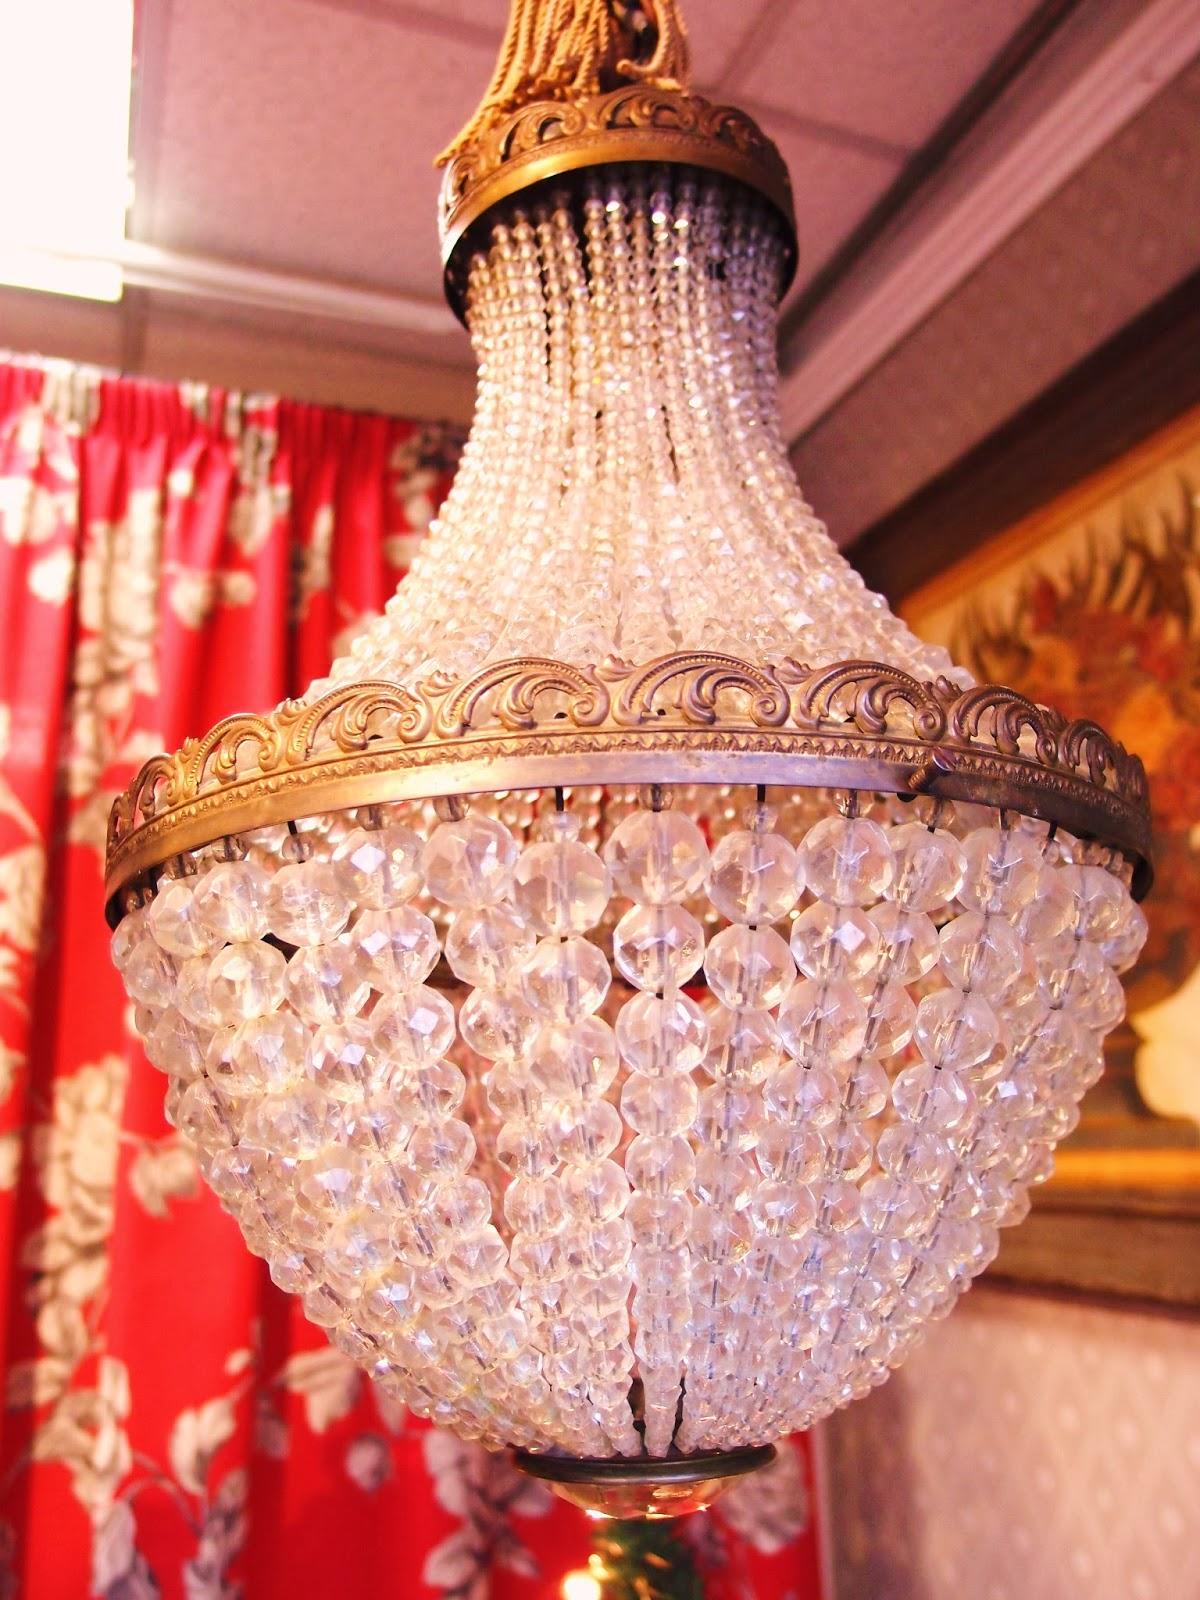 lampadari rimini : IL BLOG DI ANTICHITA BELLINI: Lampadari antichi in negozio...